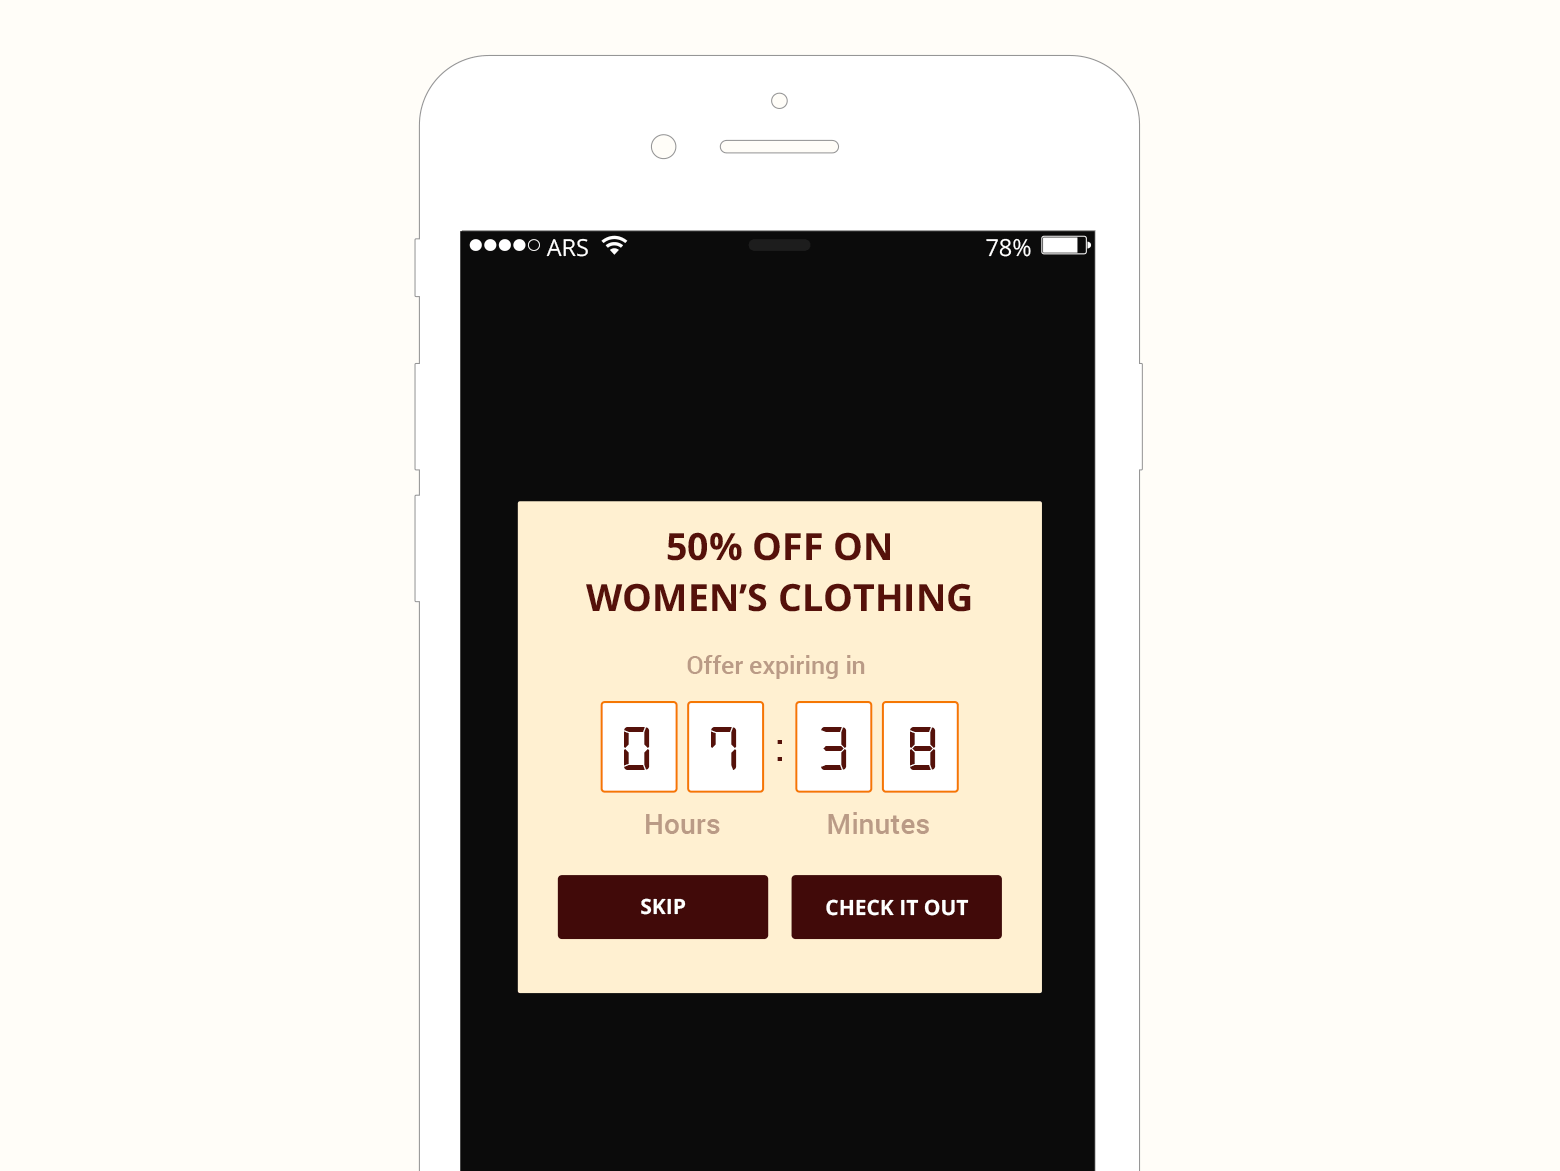 flash sale in-app notification